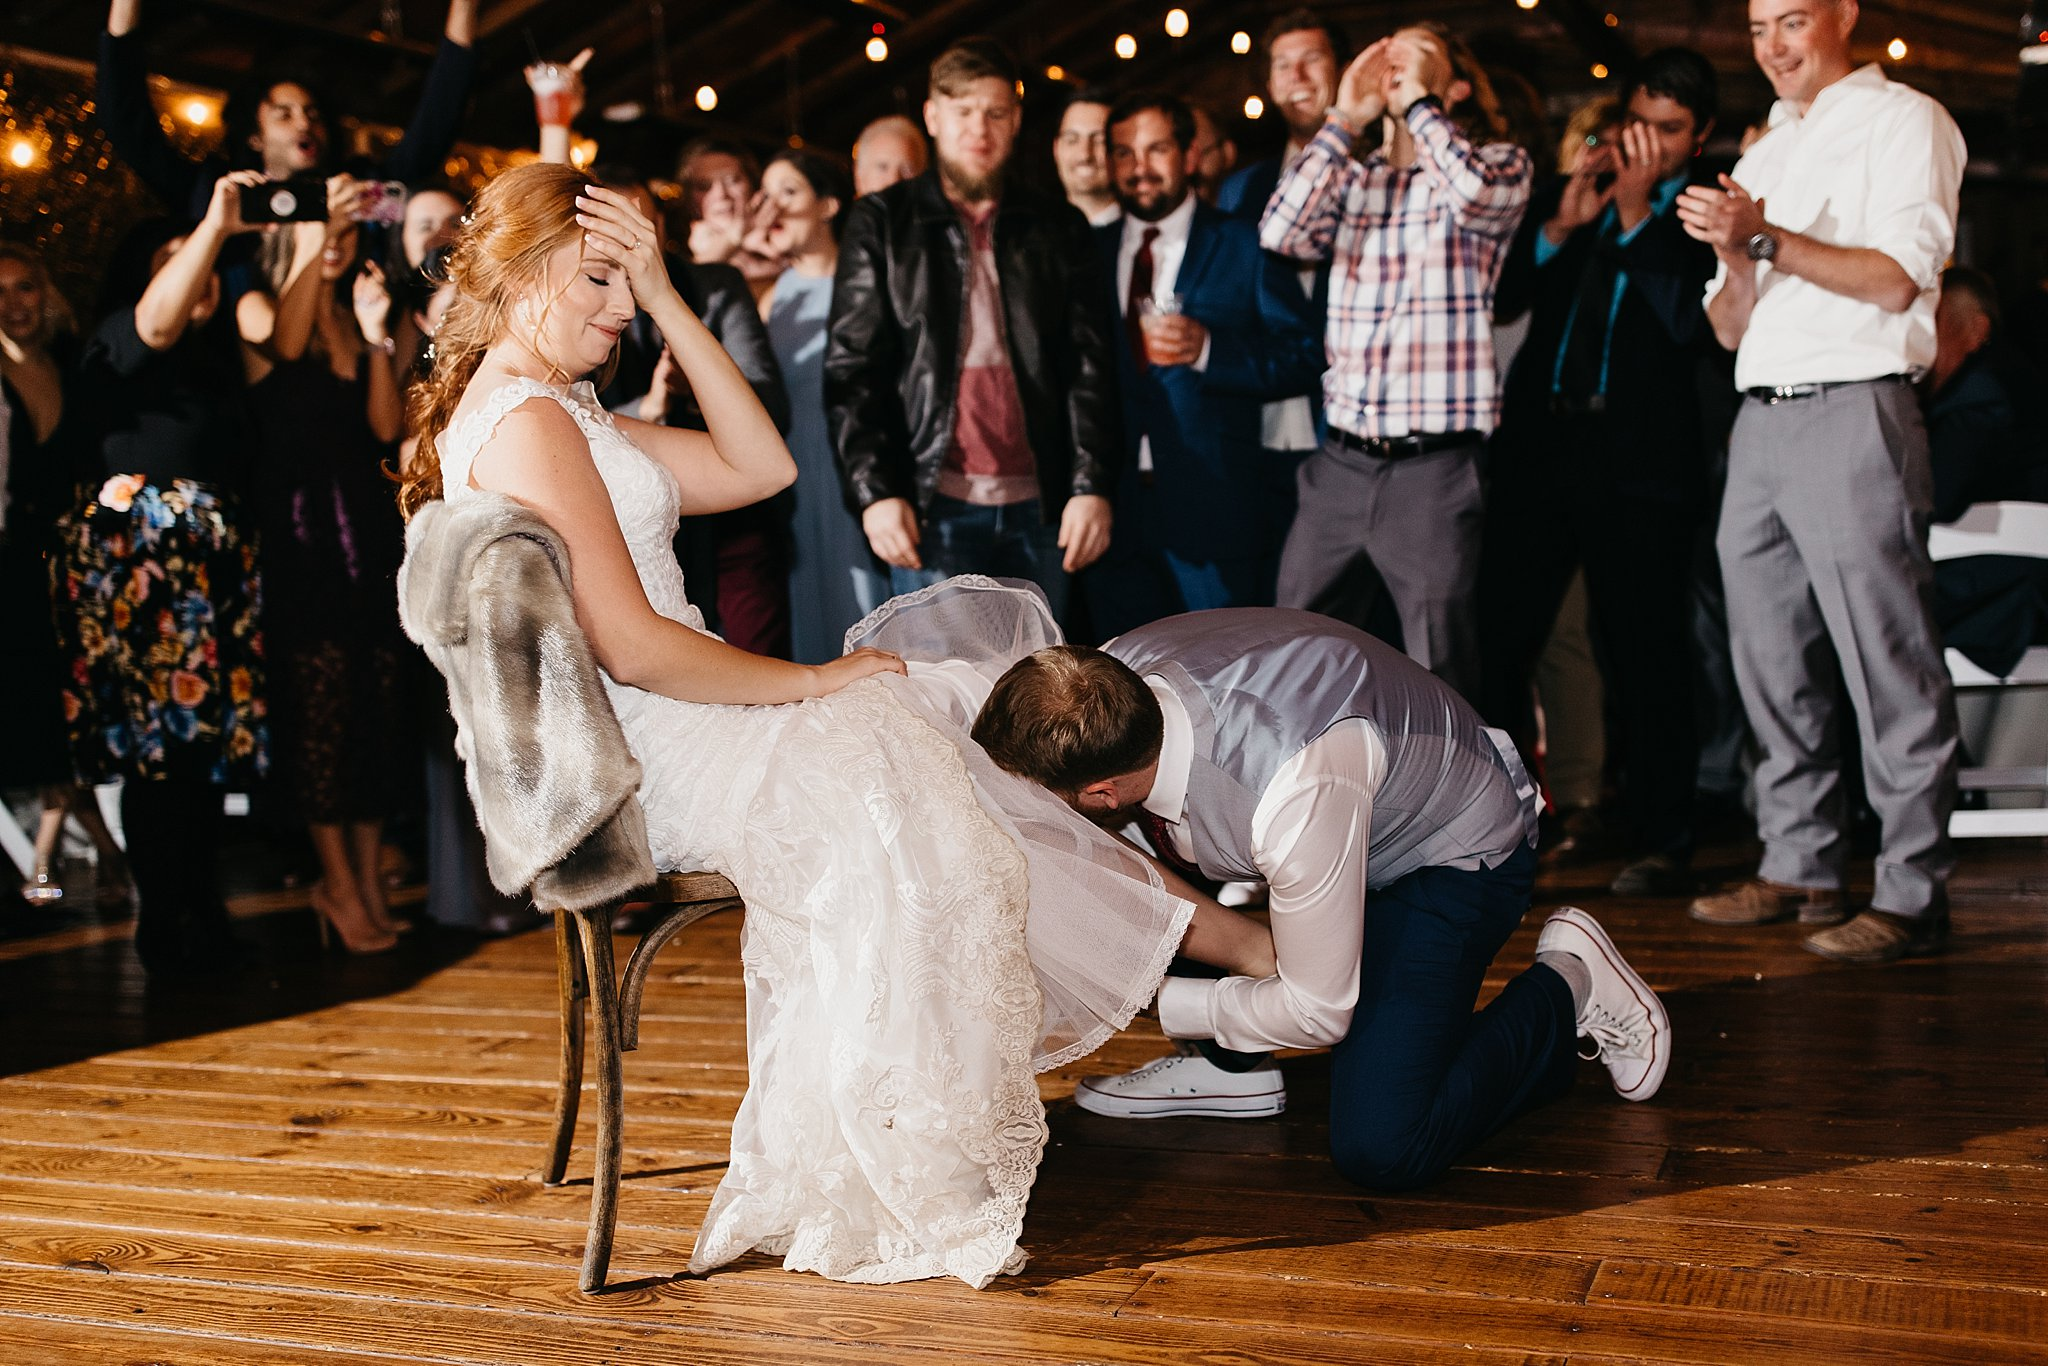 Wilderlove Co_Fall Wedding_McKinney Texas_Avalon Legacy Ranch_Wedding Photography_0032.jpg